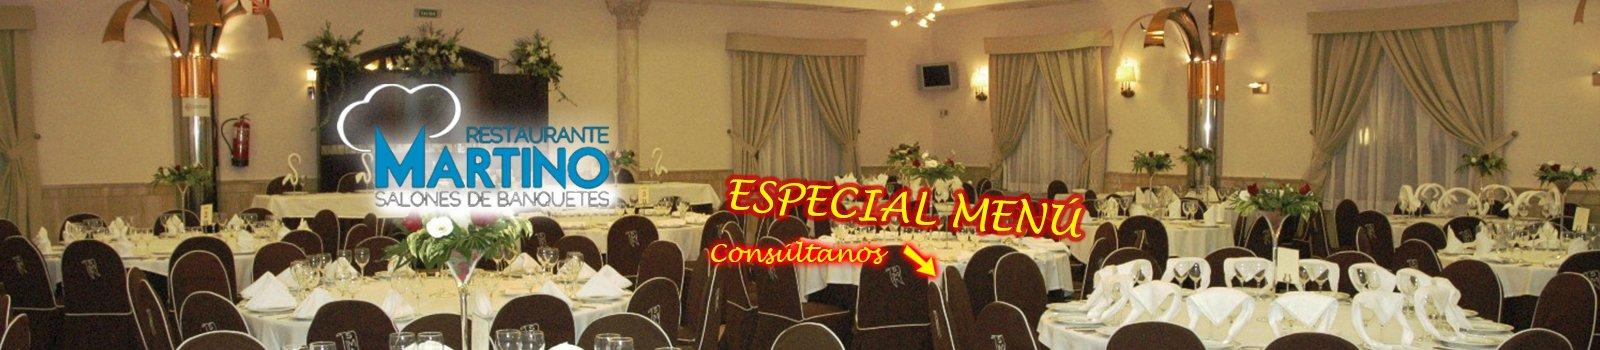 Restaurantes Martino en Elche, Restaurante en elche, restaurante en santa pola, restaurante en crevi